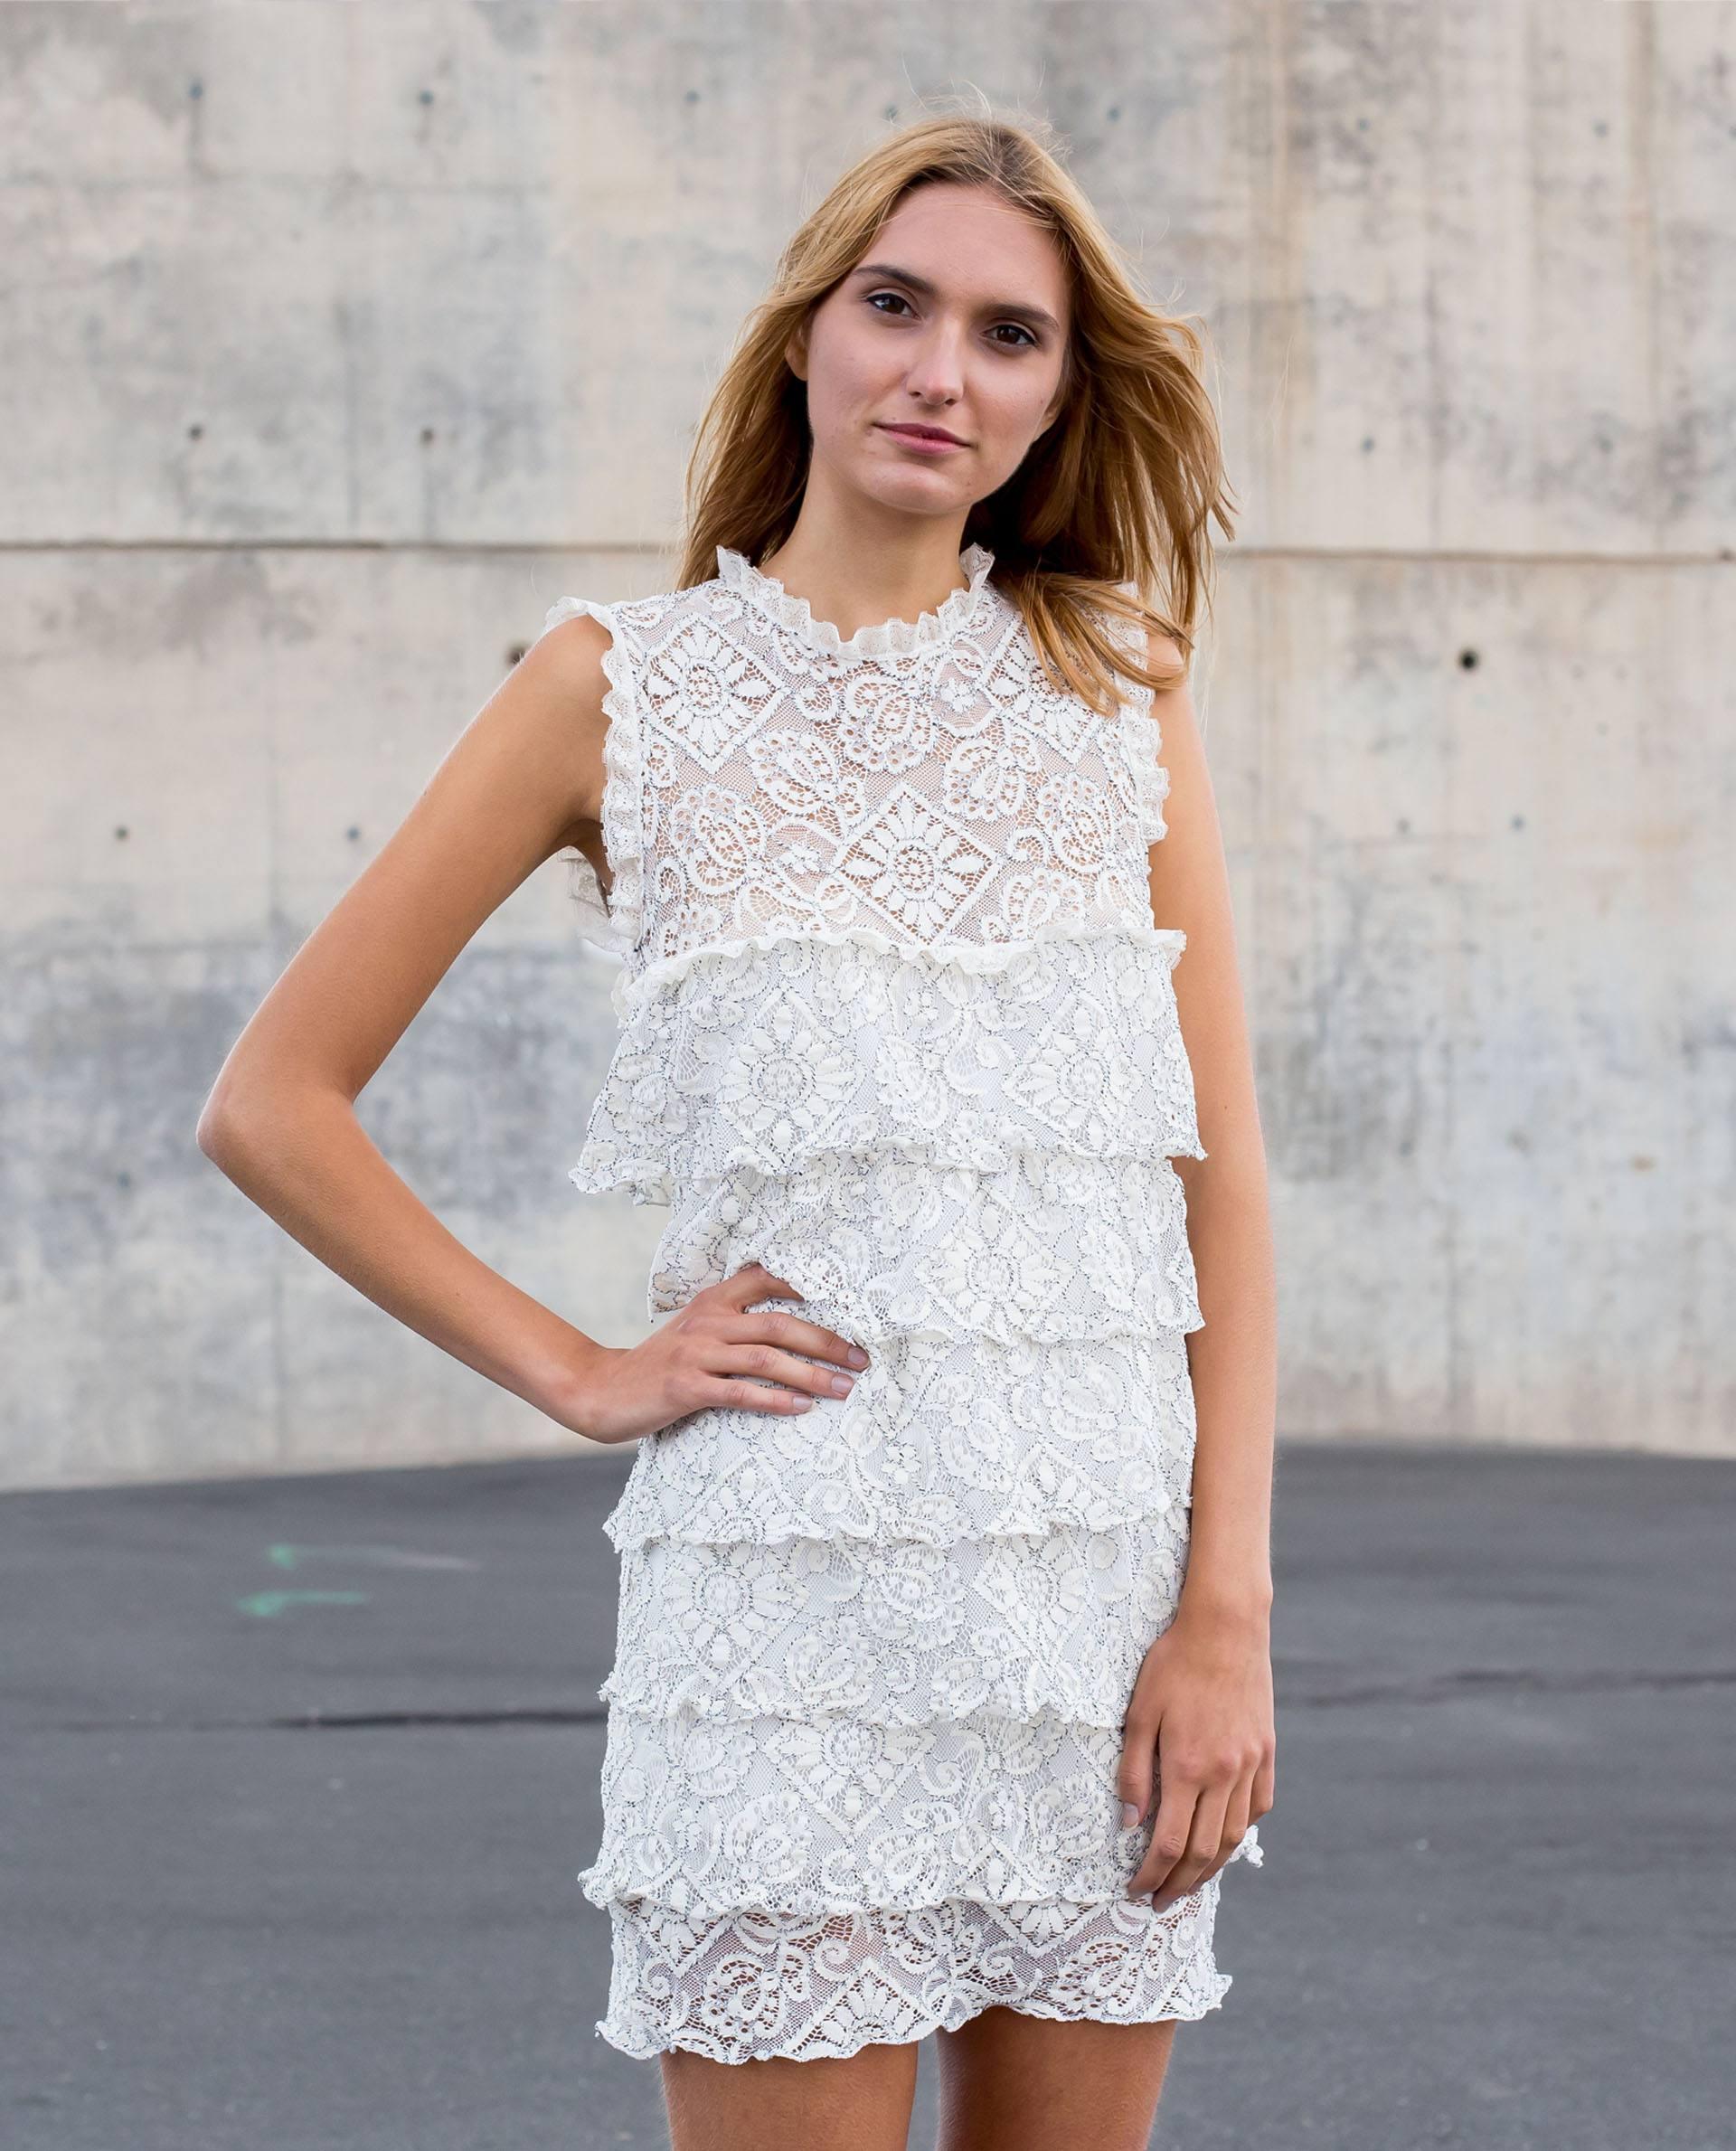 PRÊT À PORTER-SPRING/SUMMER 2018 - VESTIDOS - Vestido recto mini de encaje blanco